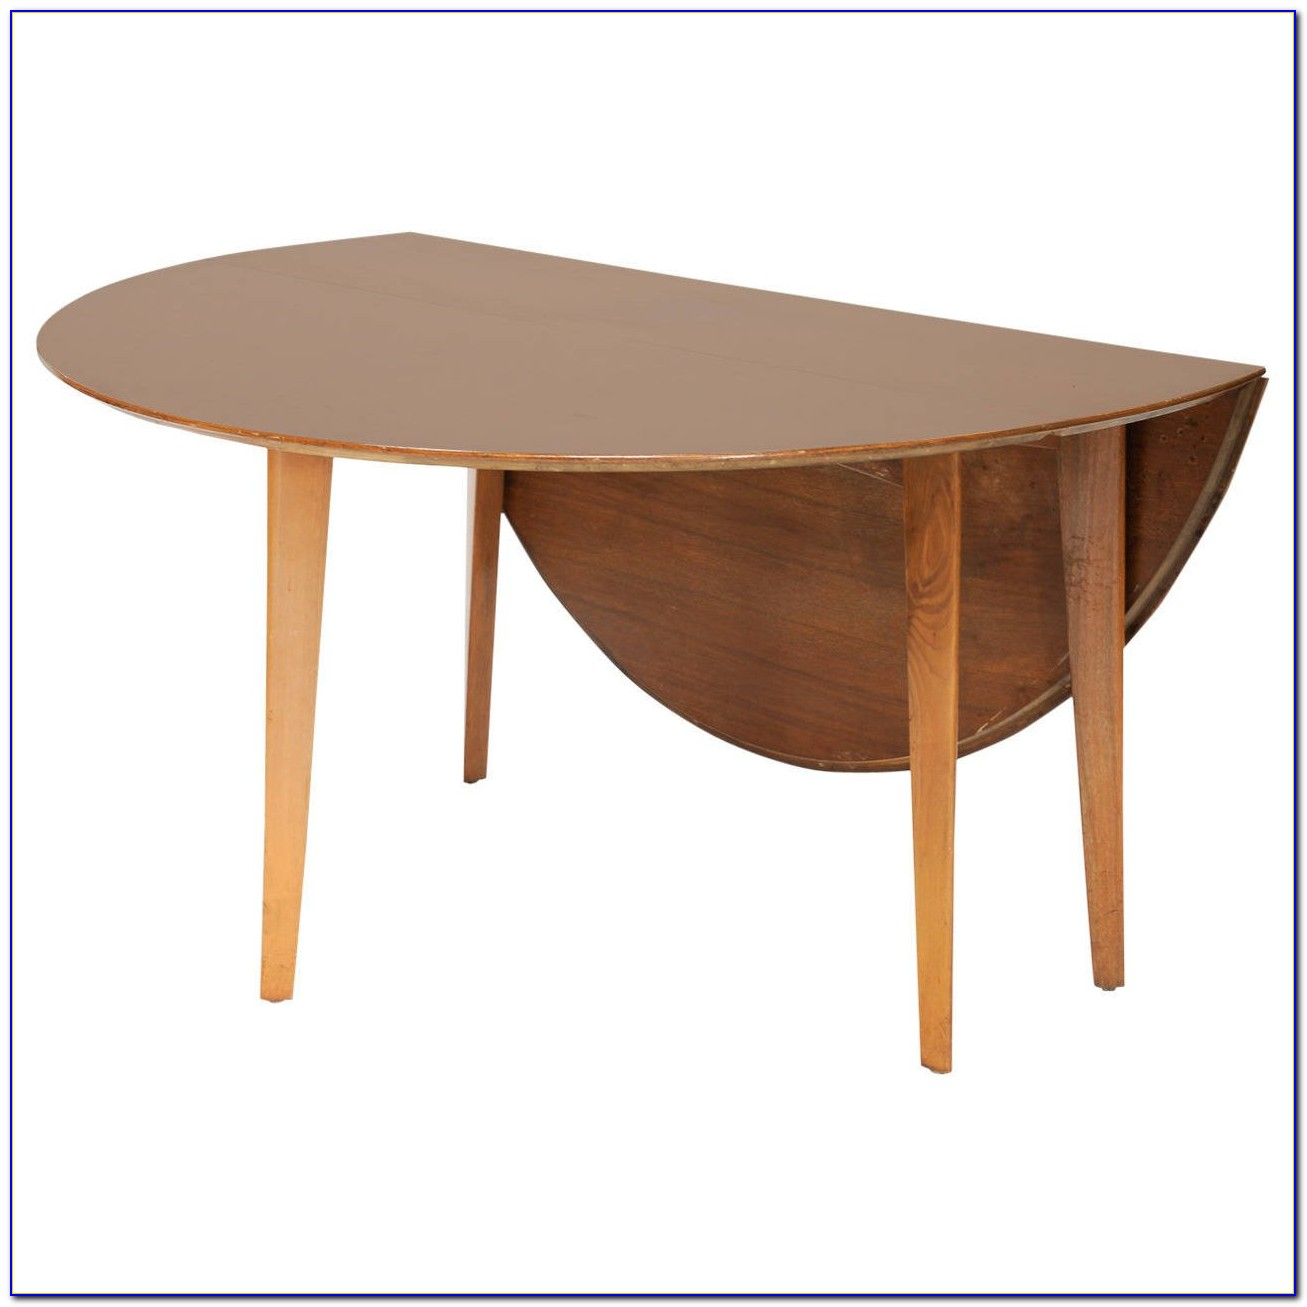 Kincaid Drop Leaf Sofa Table